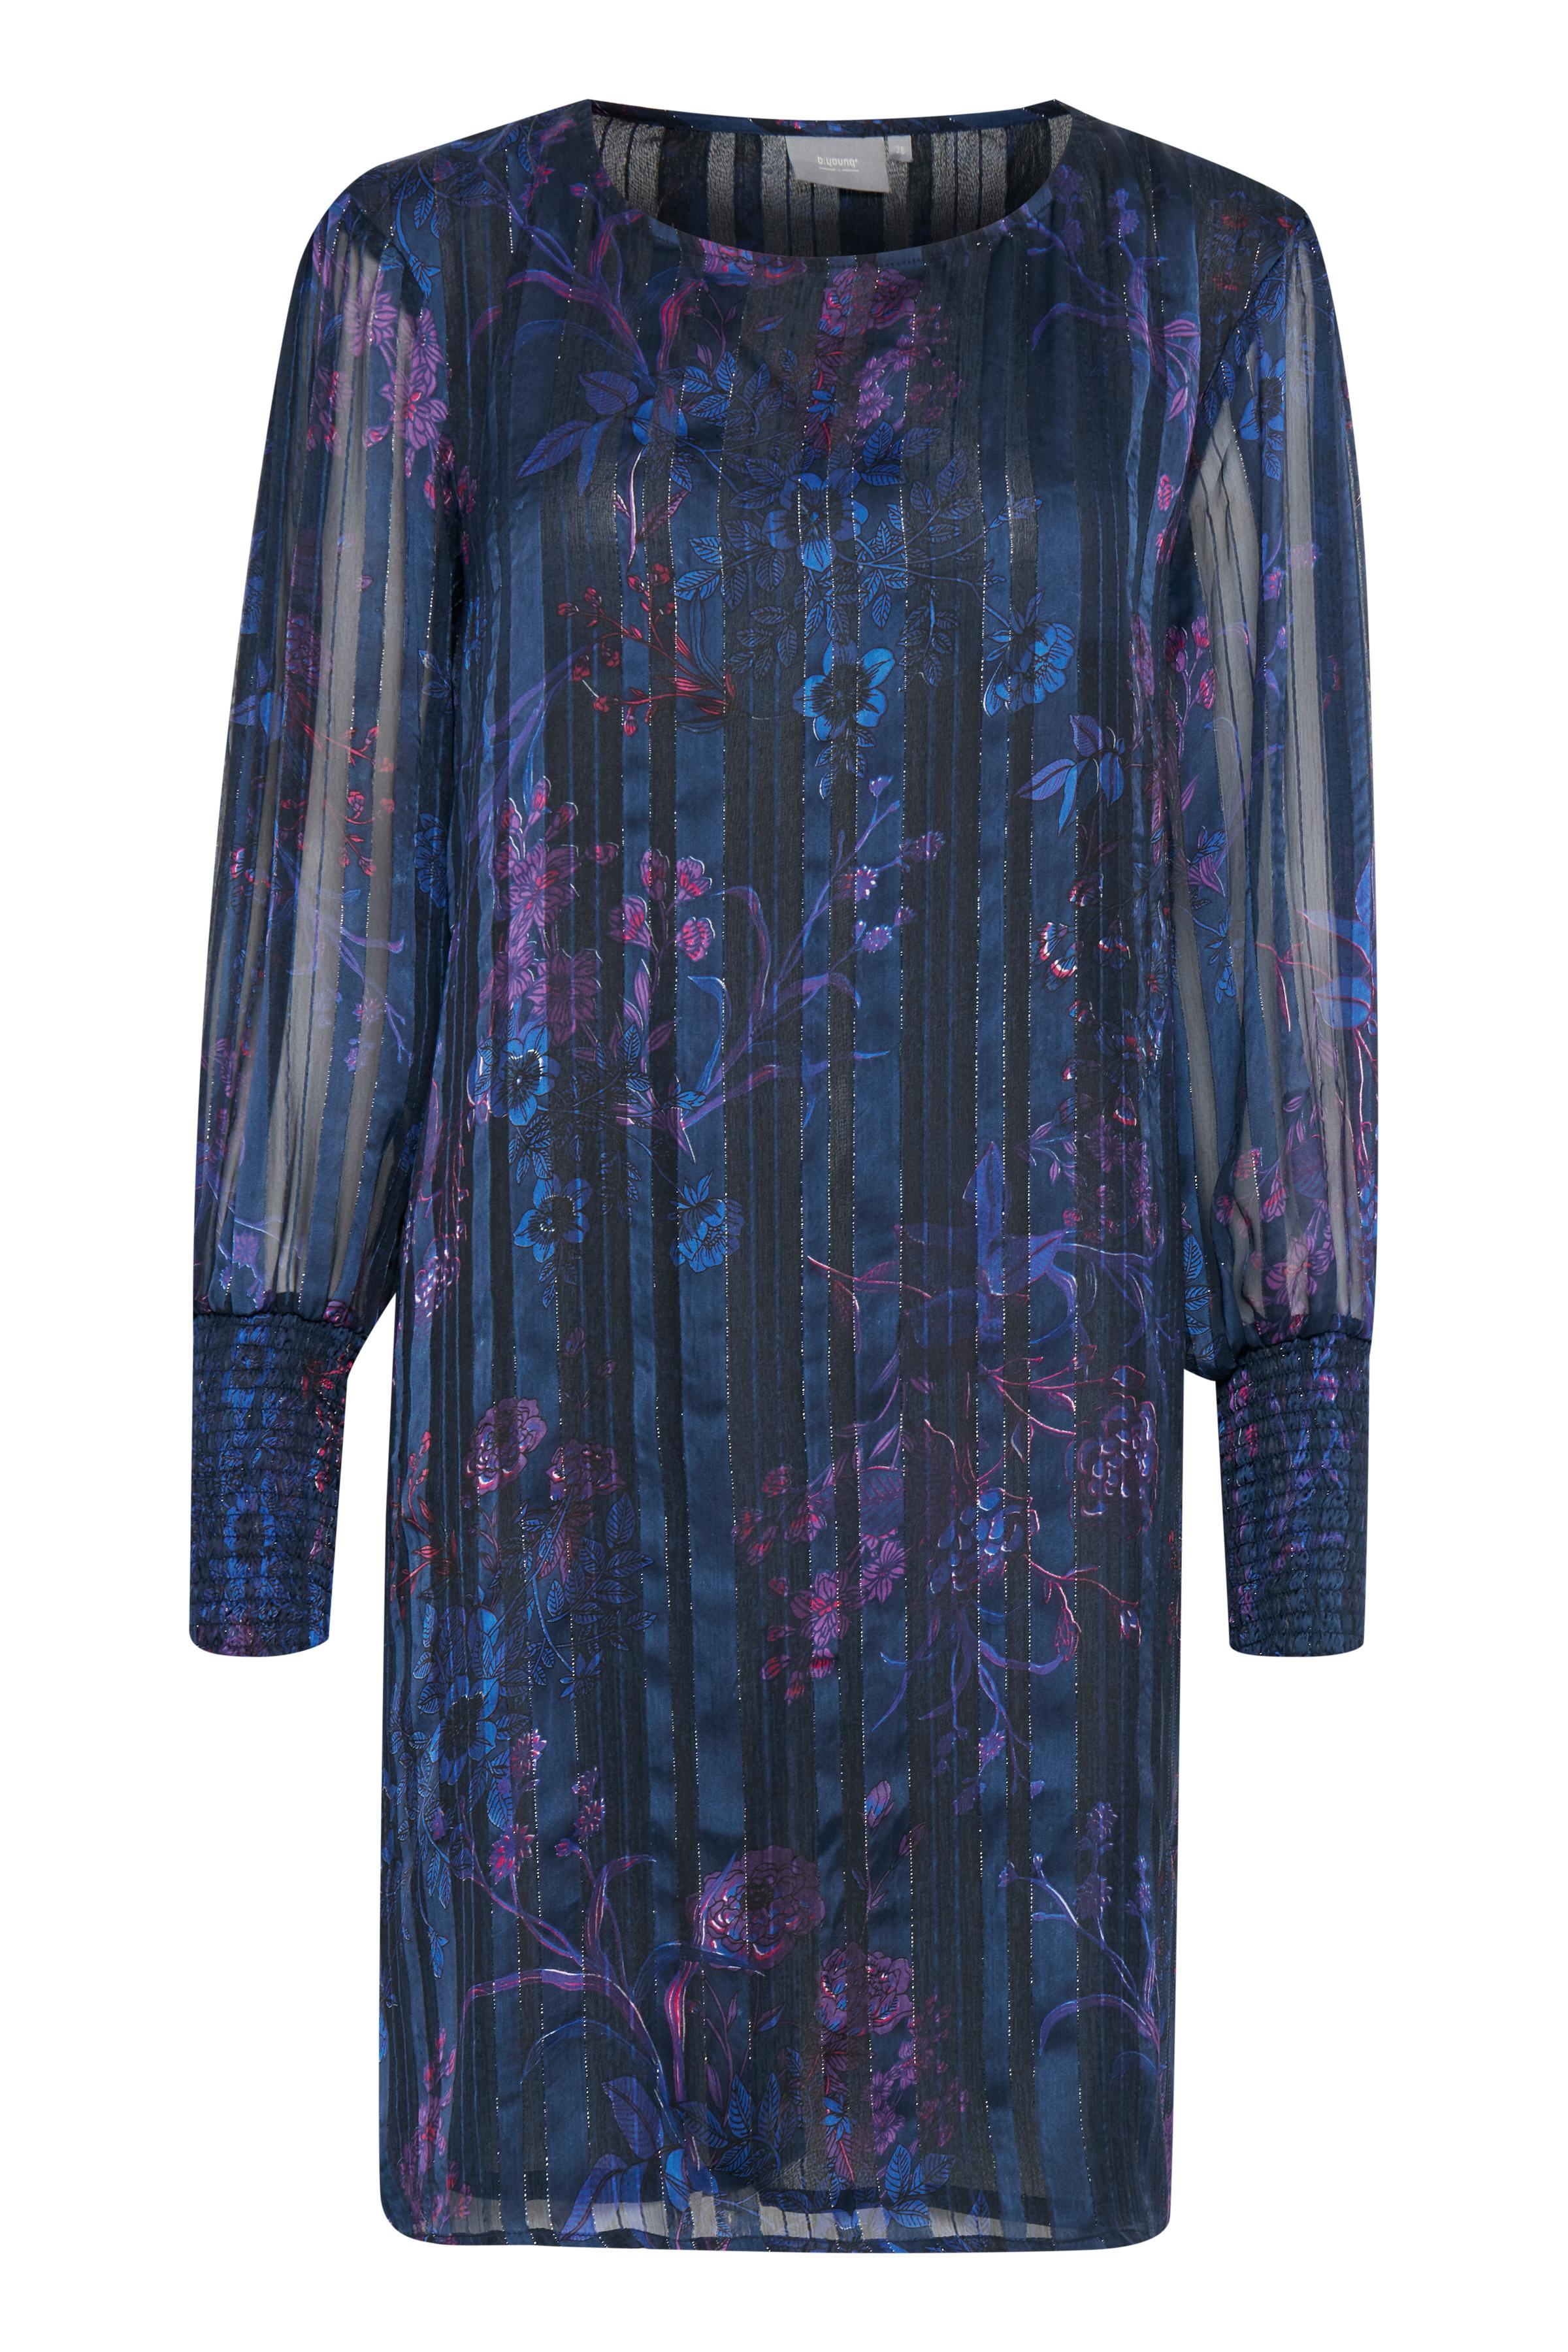 b.young Dame A-formet kjole - Marineblå/lilla